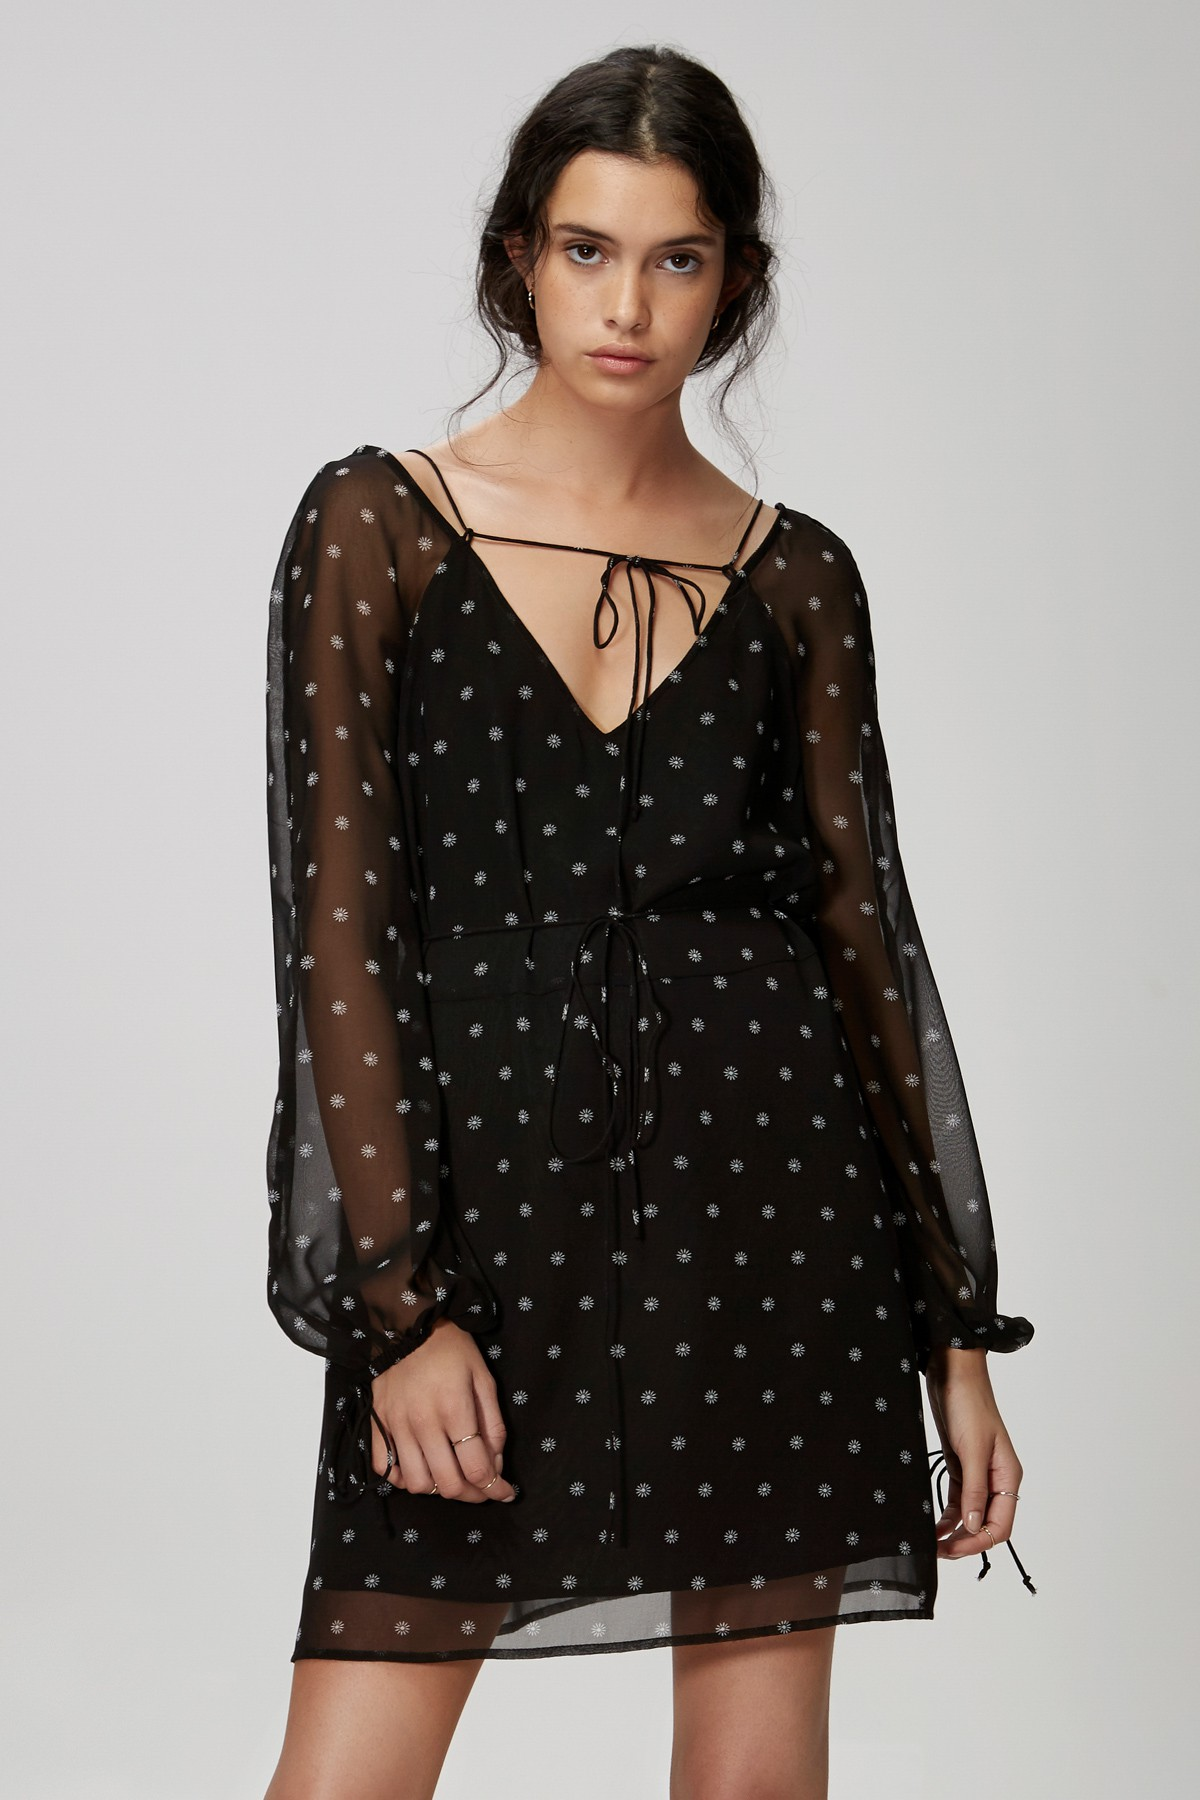 The Fifth Label Midnight Memories L/S Dress.